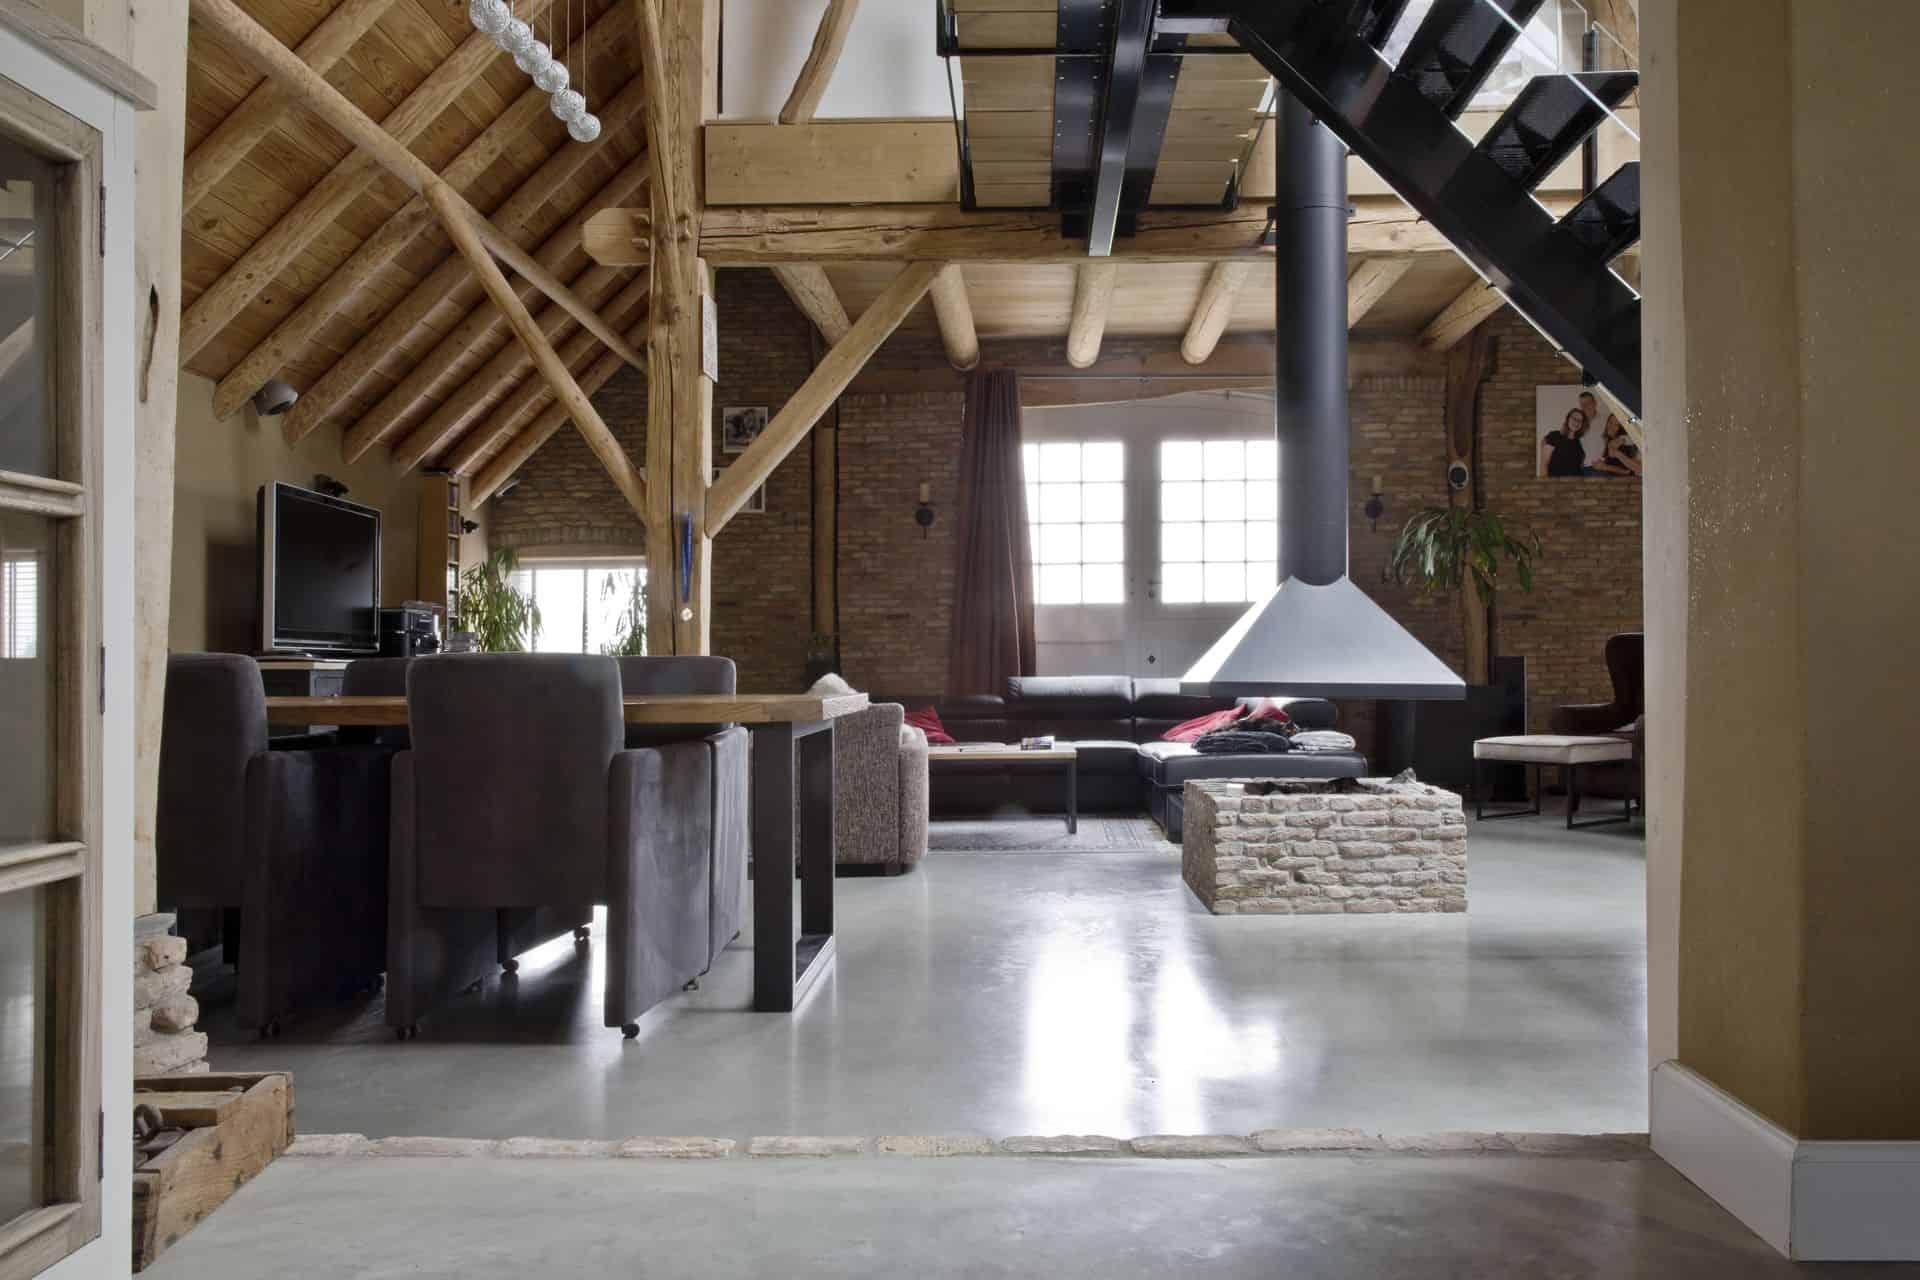 Gevlinderd beton, woonbeton, betonnen vloer